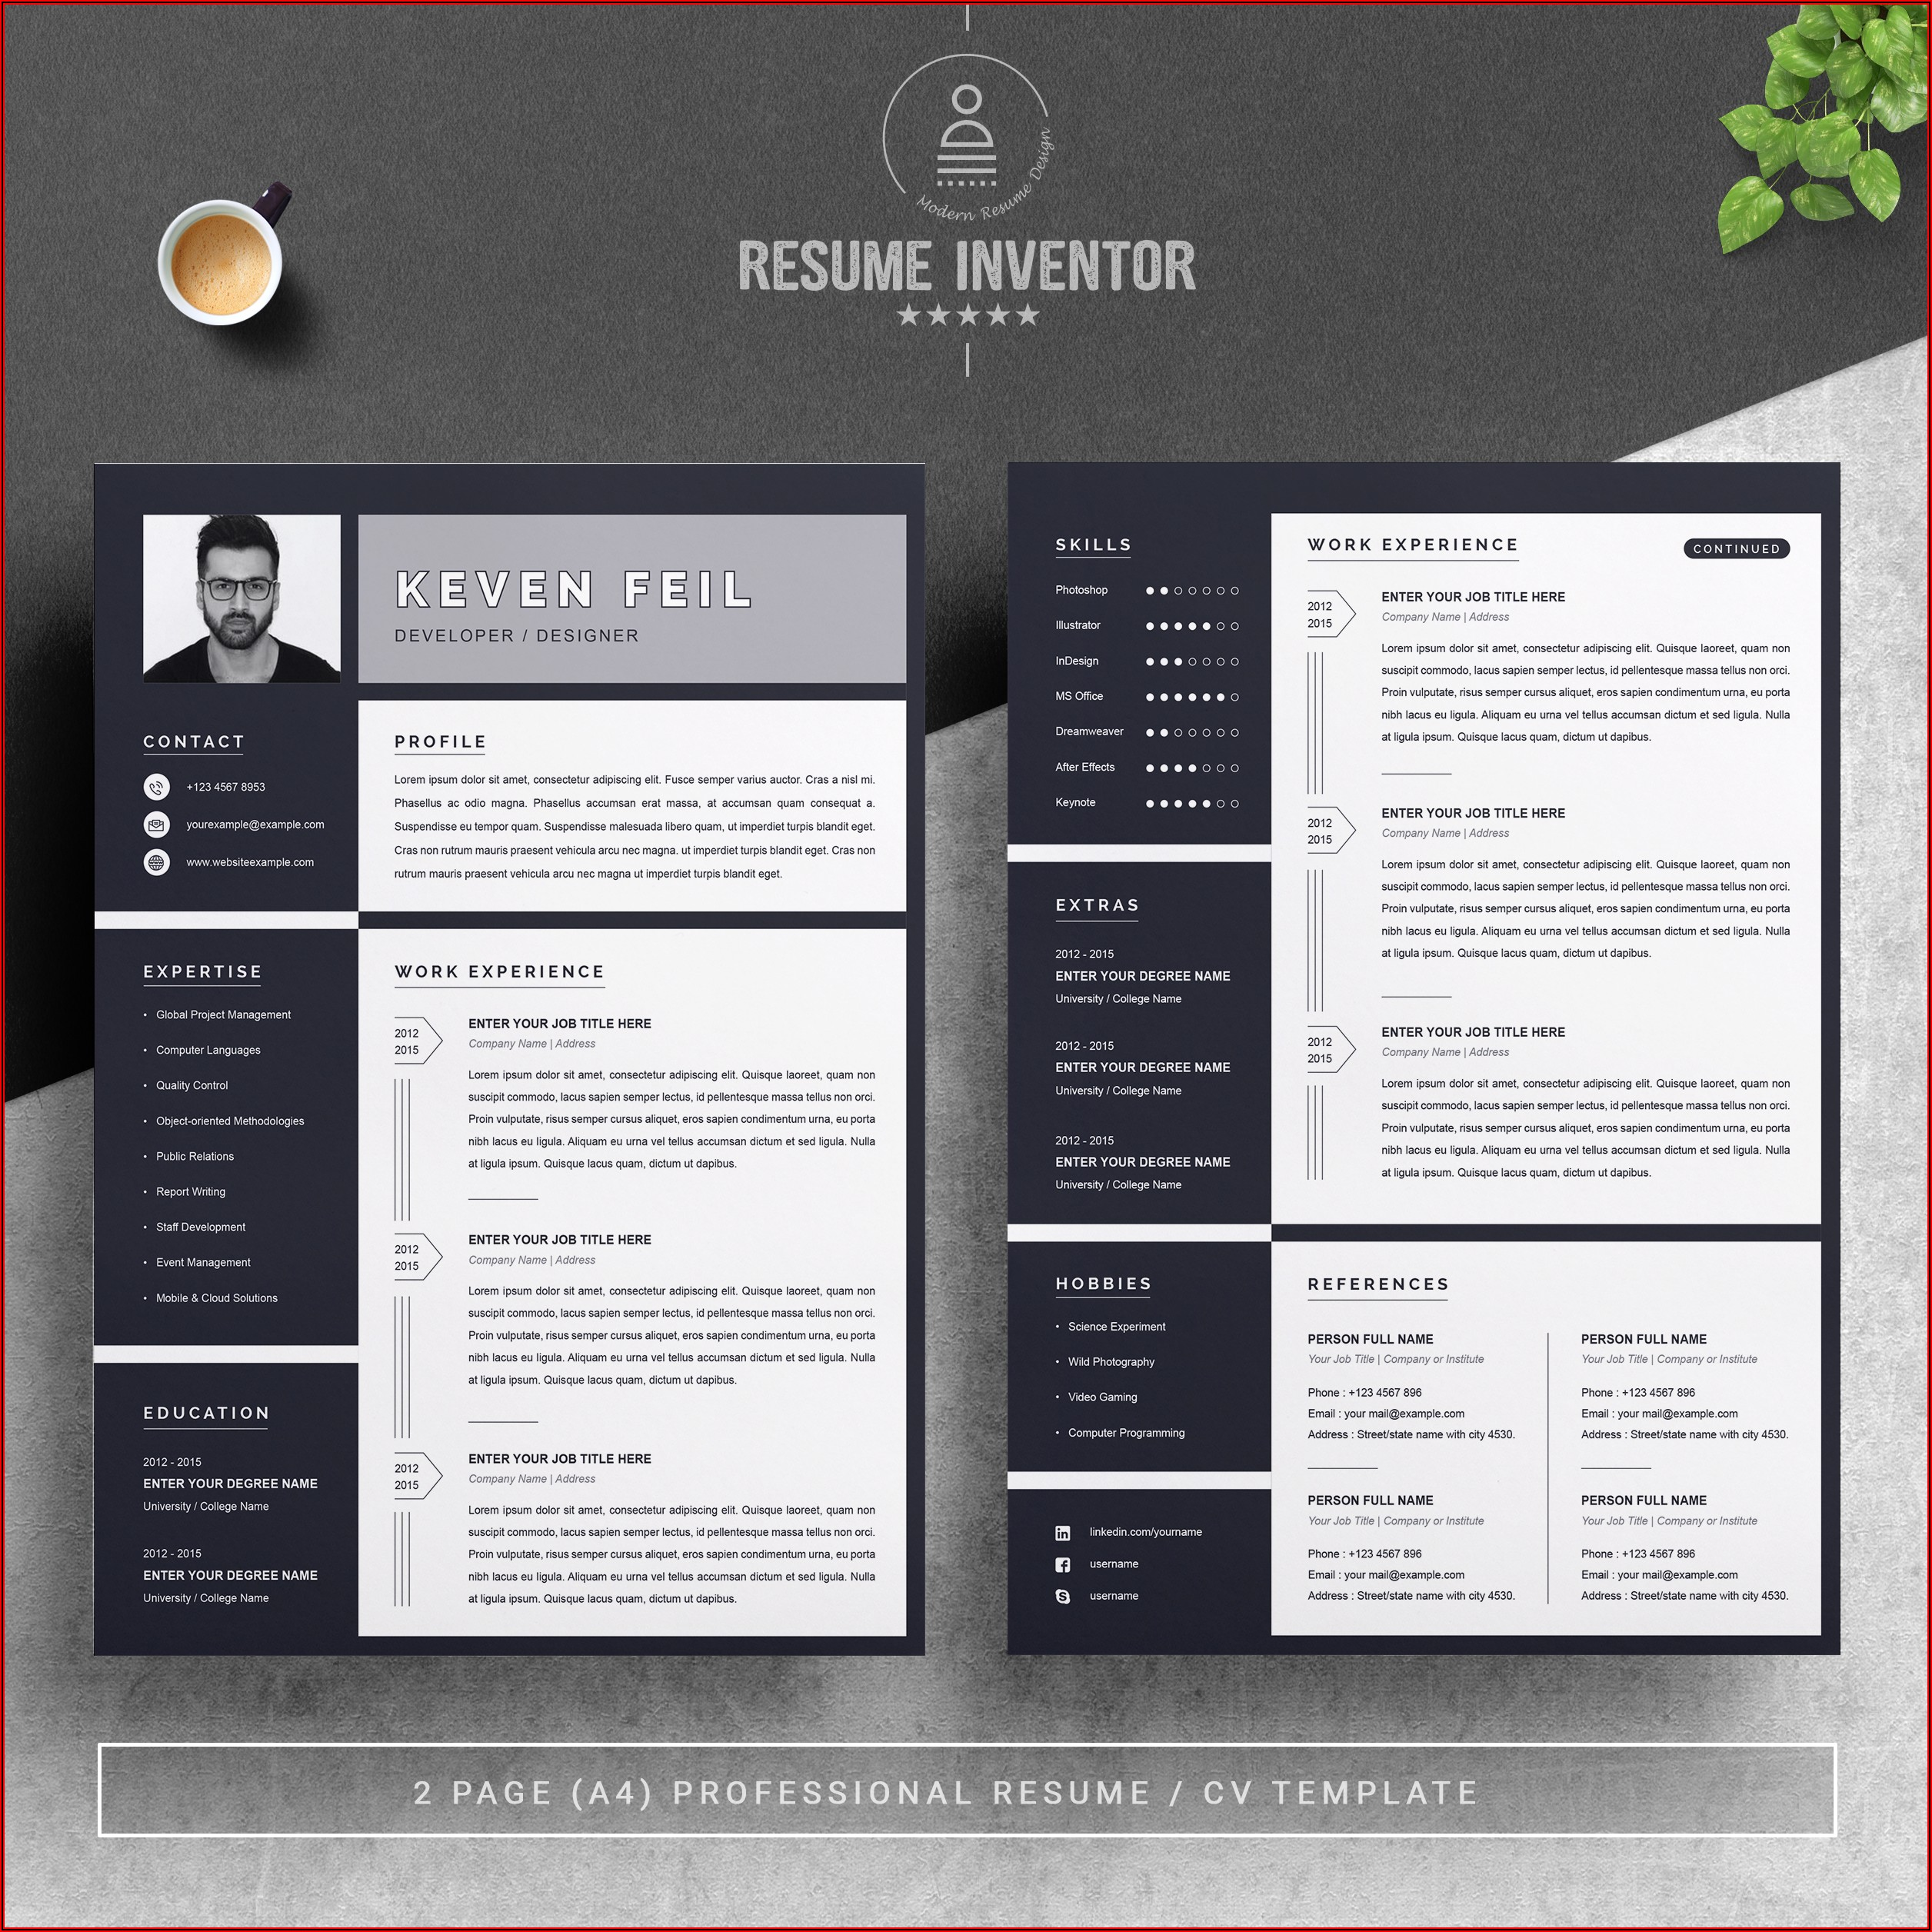 Free Resume Templates Online To Print